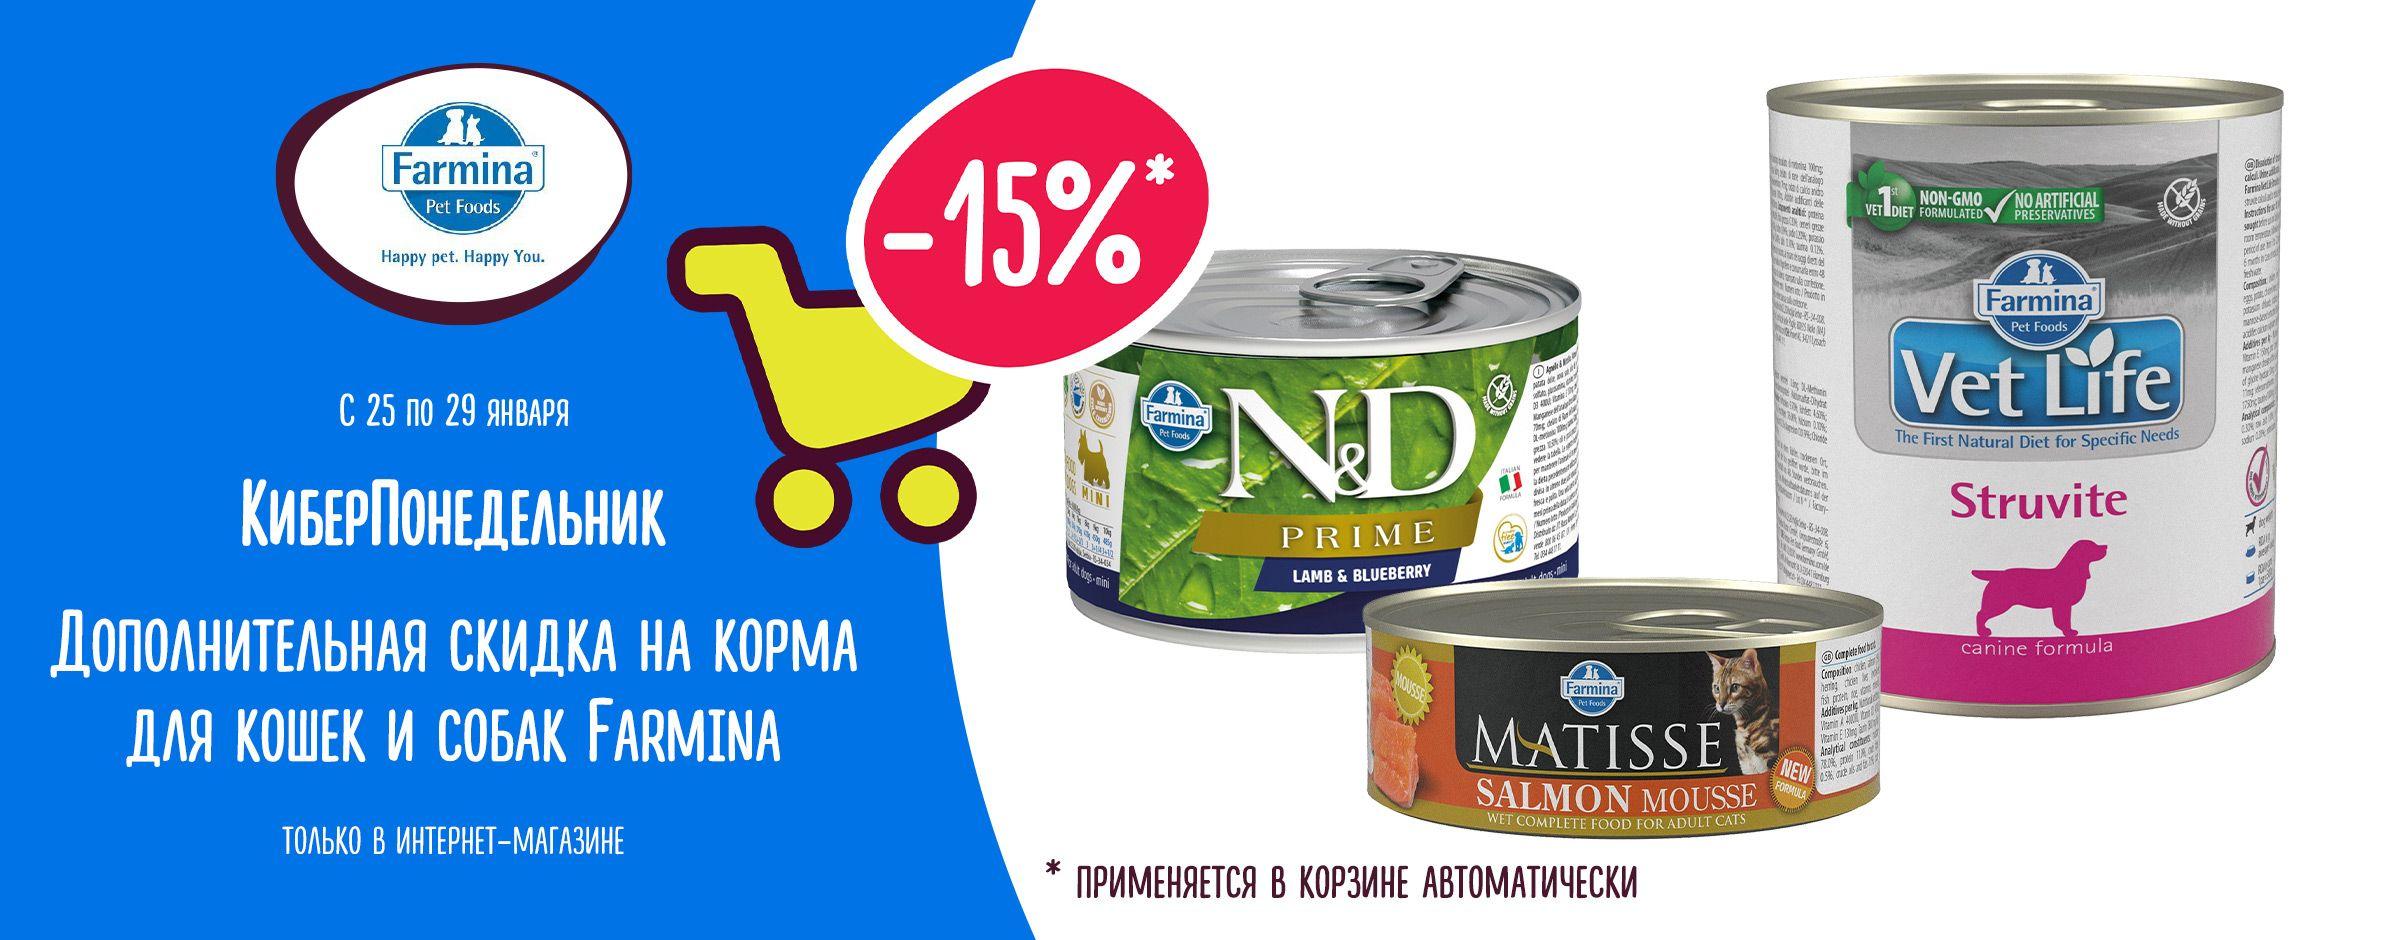 Доп. скидка 15% на корма для кошек и собак Farmina в корзине